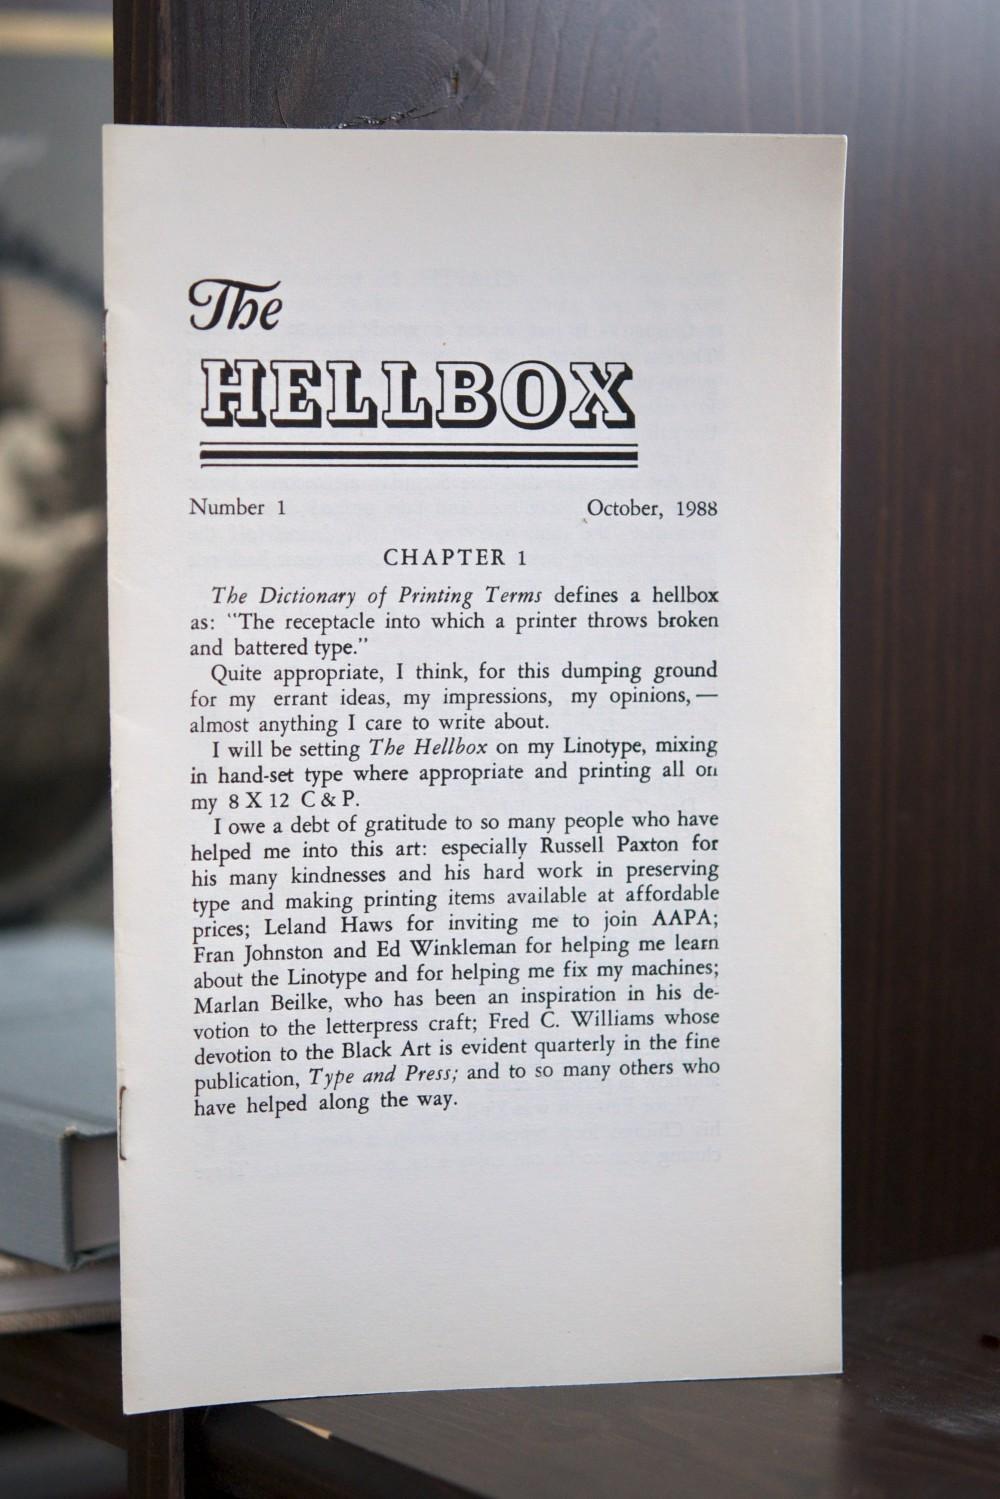 Hellbox letterpress pamphlet